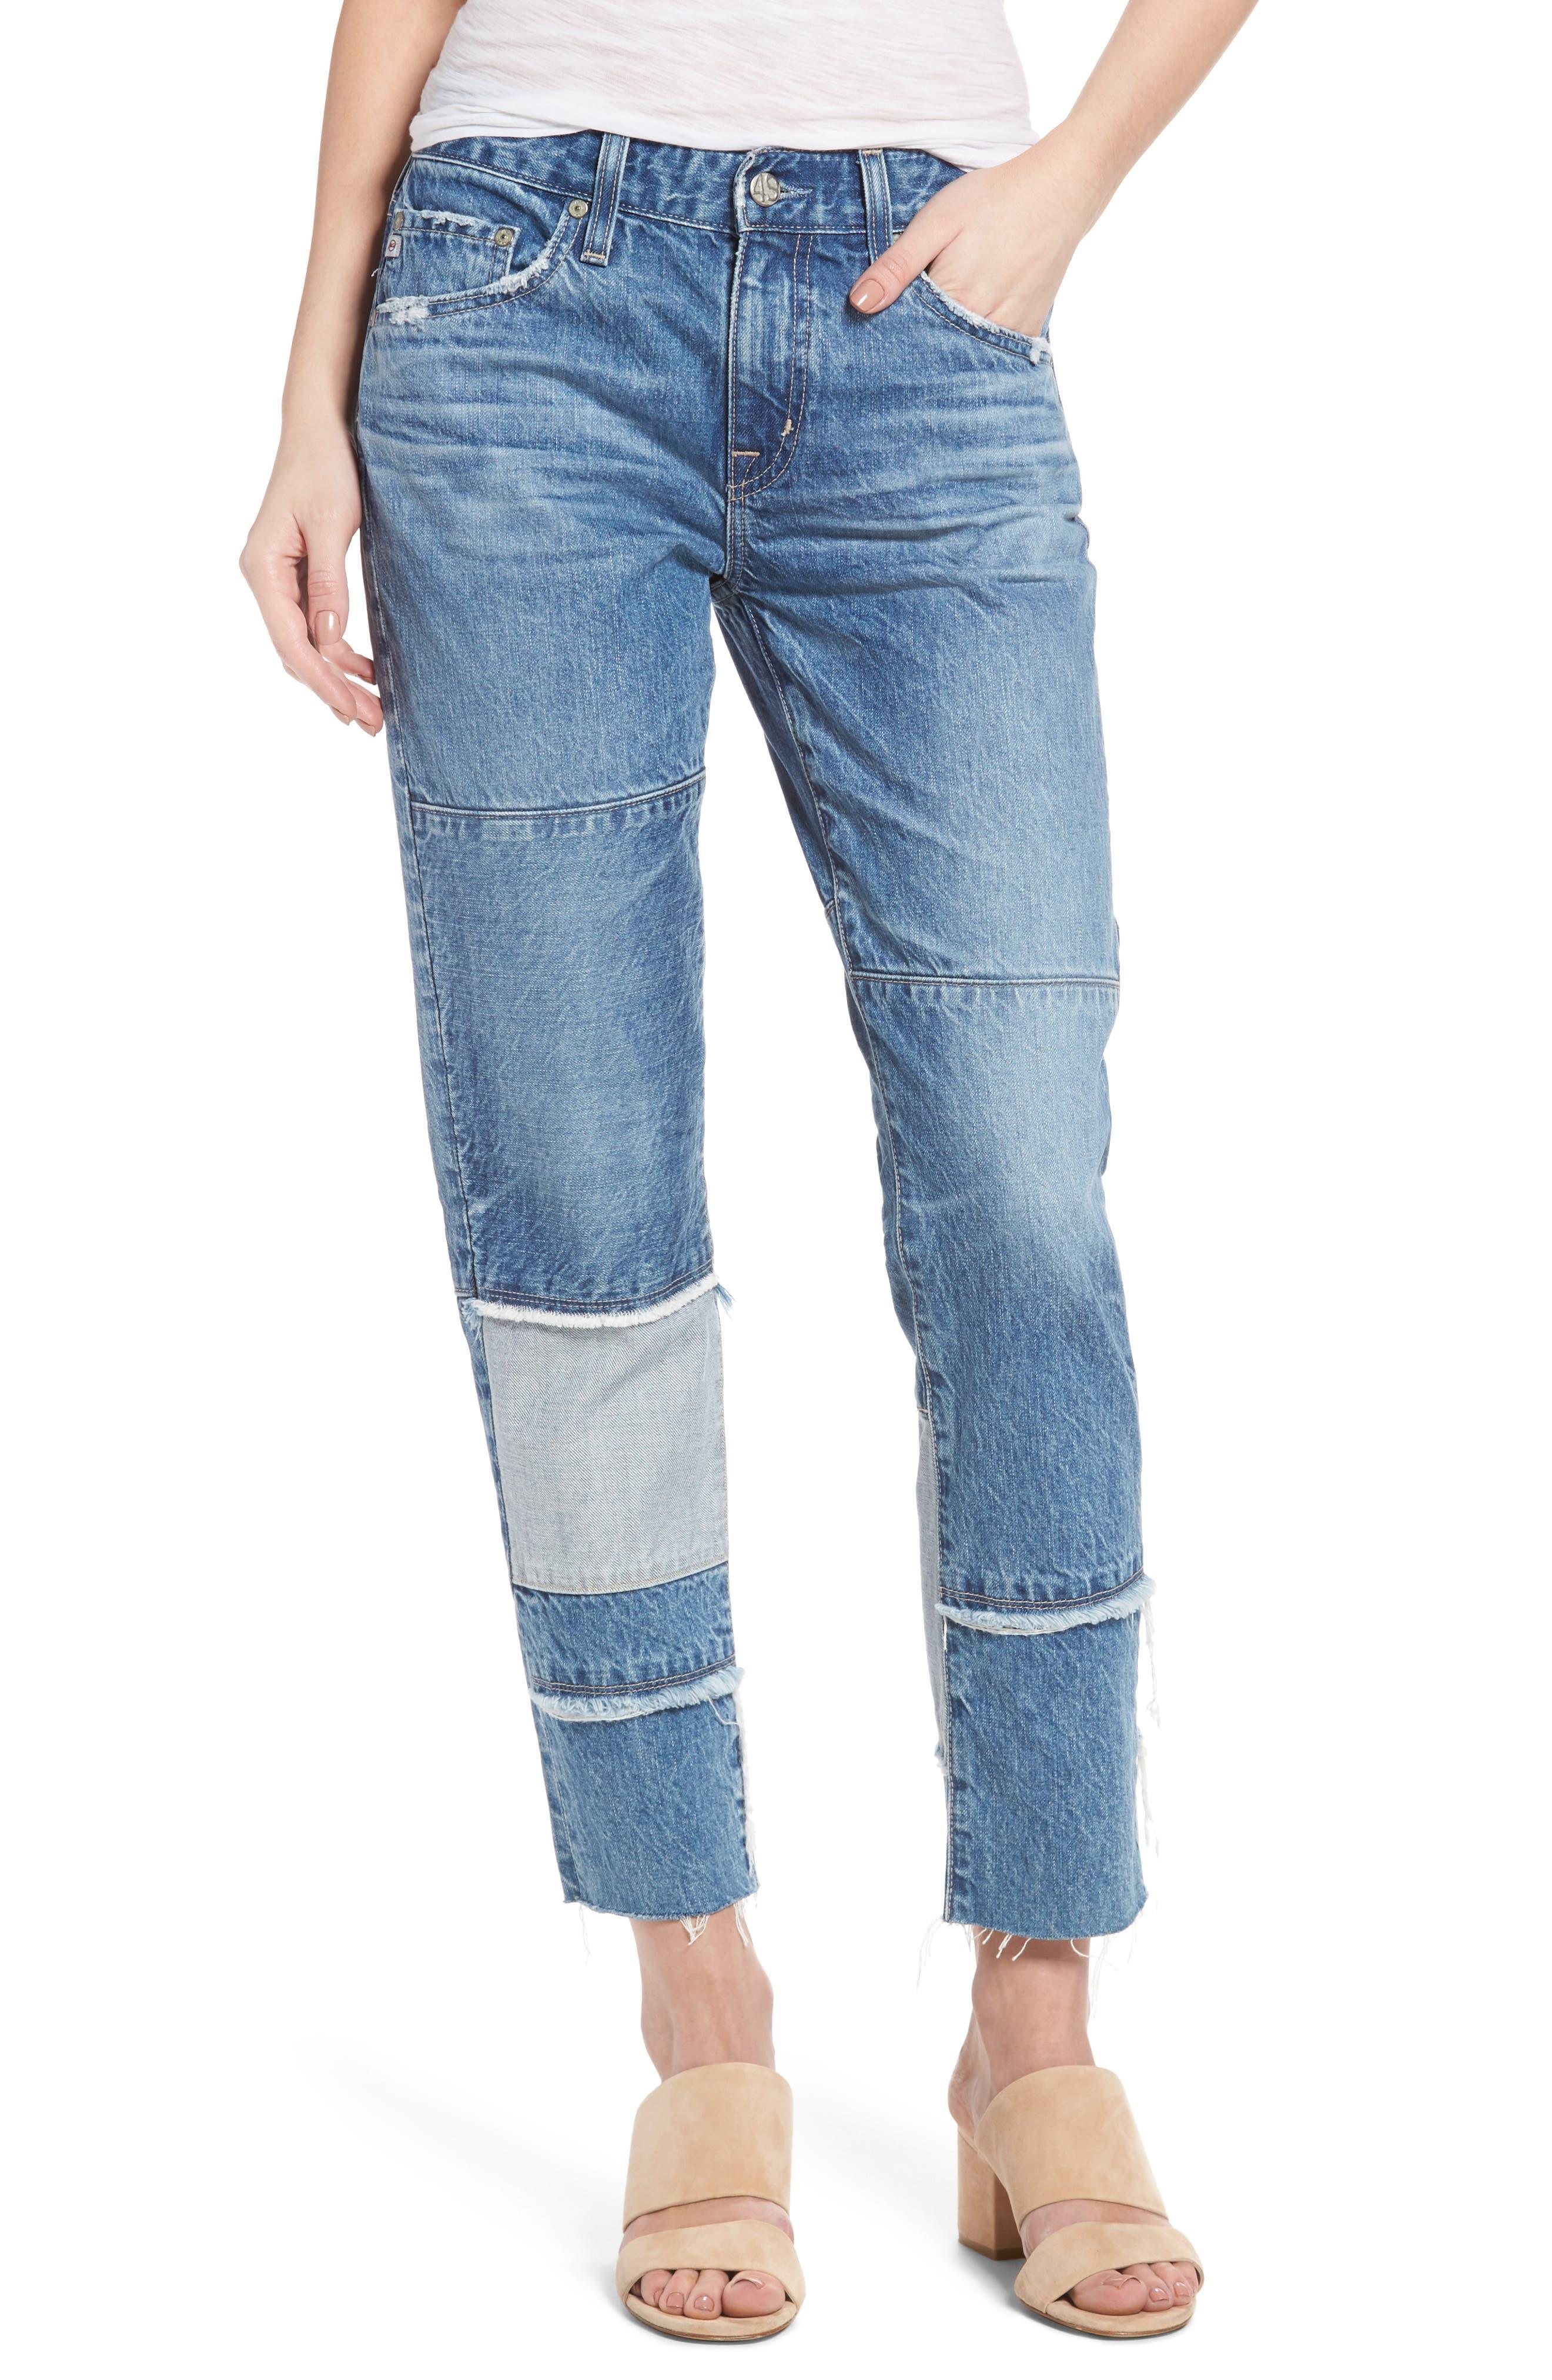 The Ex-Boyfriend Crop Slim Jeans,                         Main,                         color, 18 Years Blue Mosque